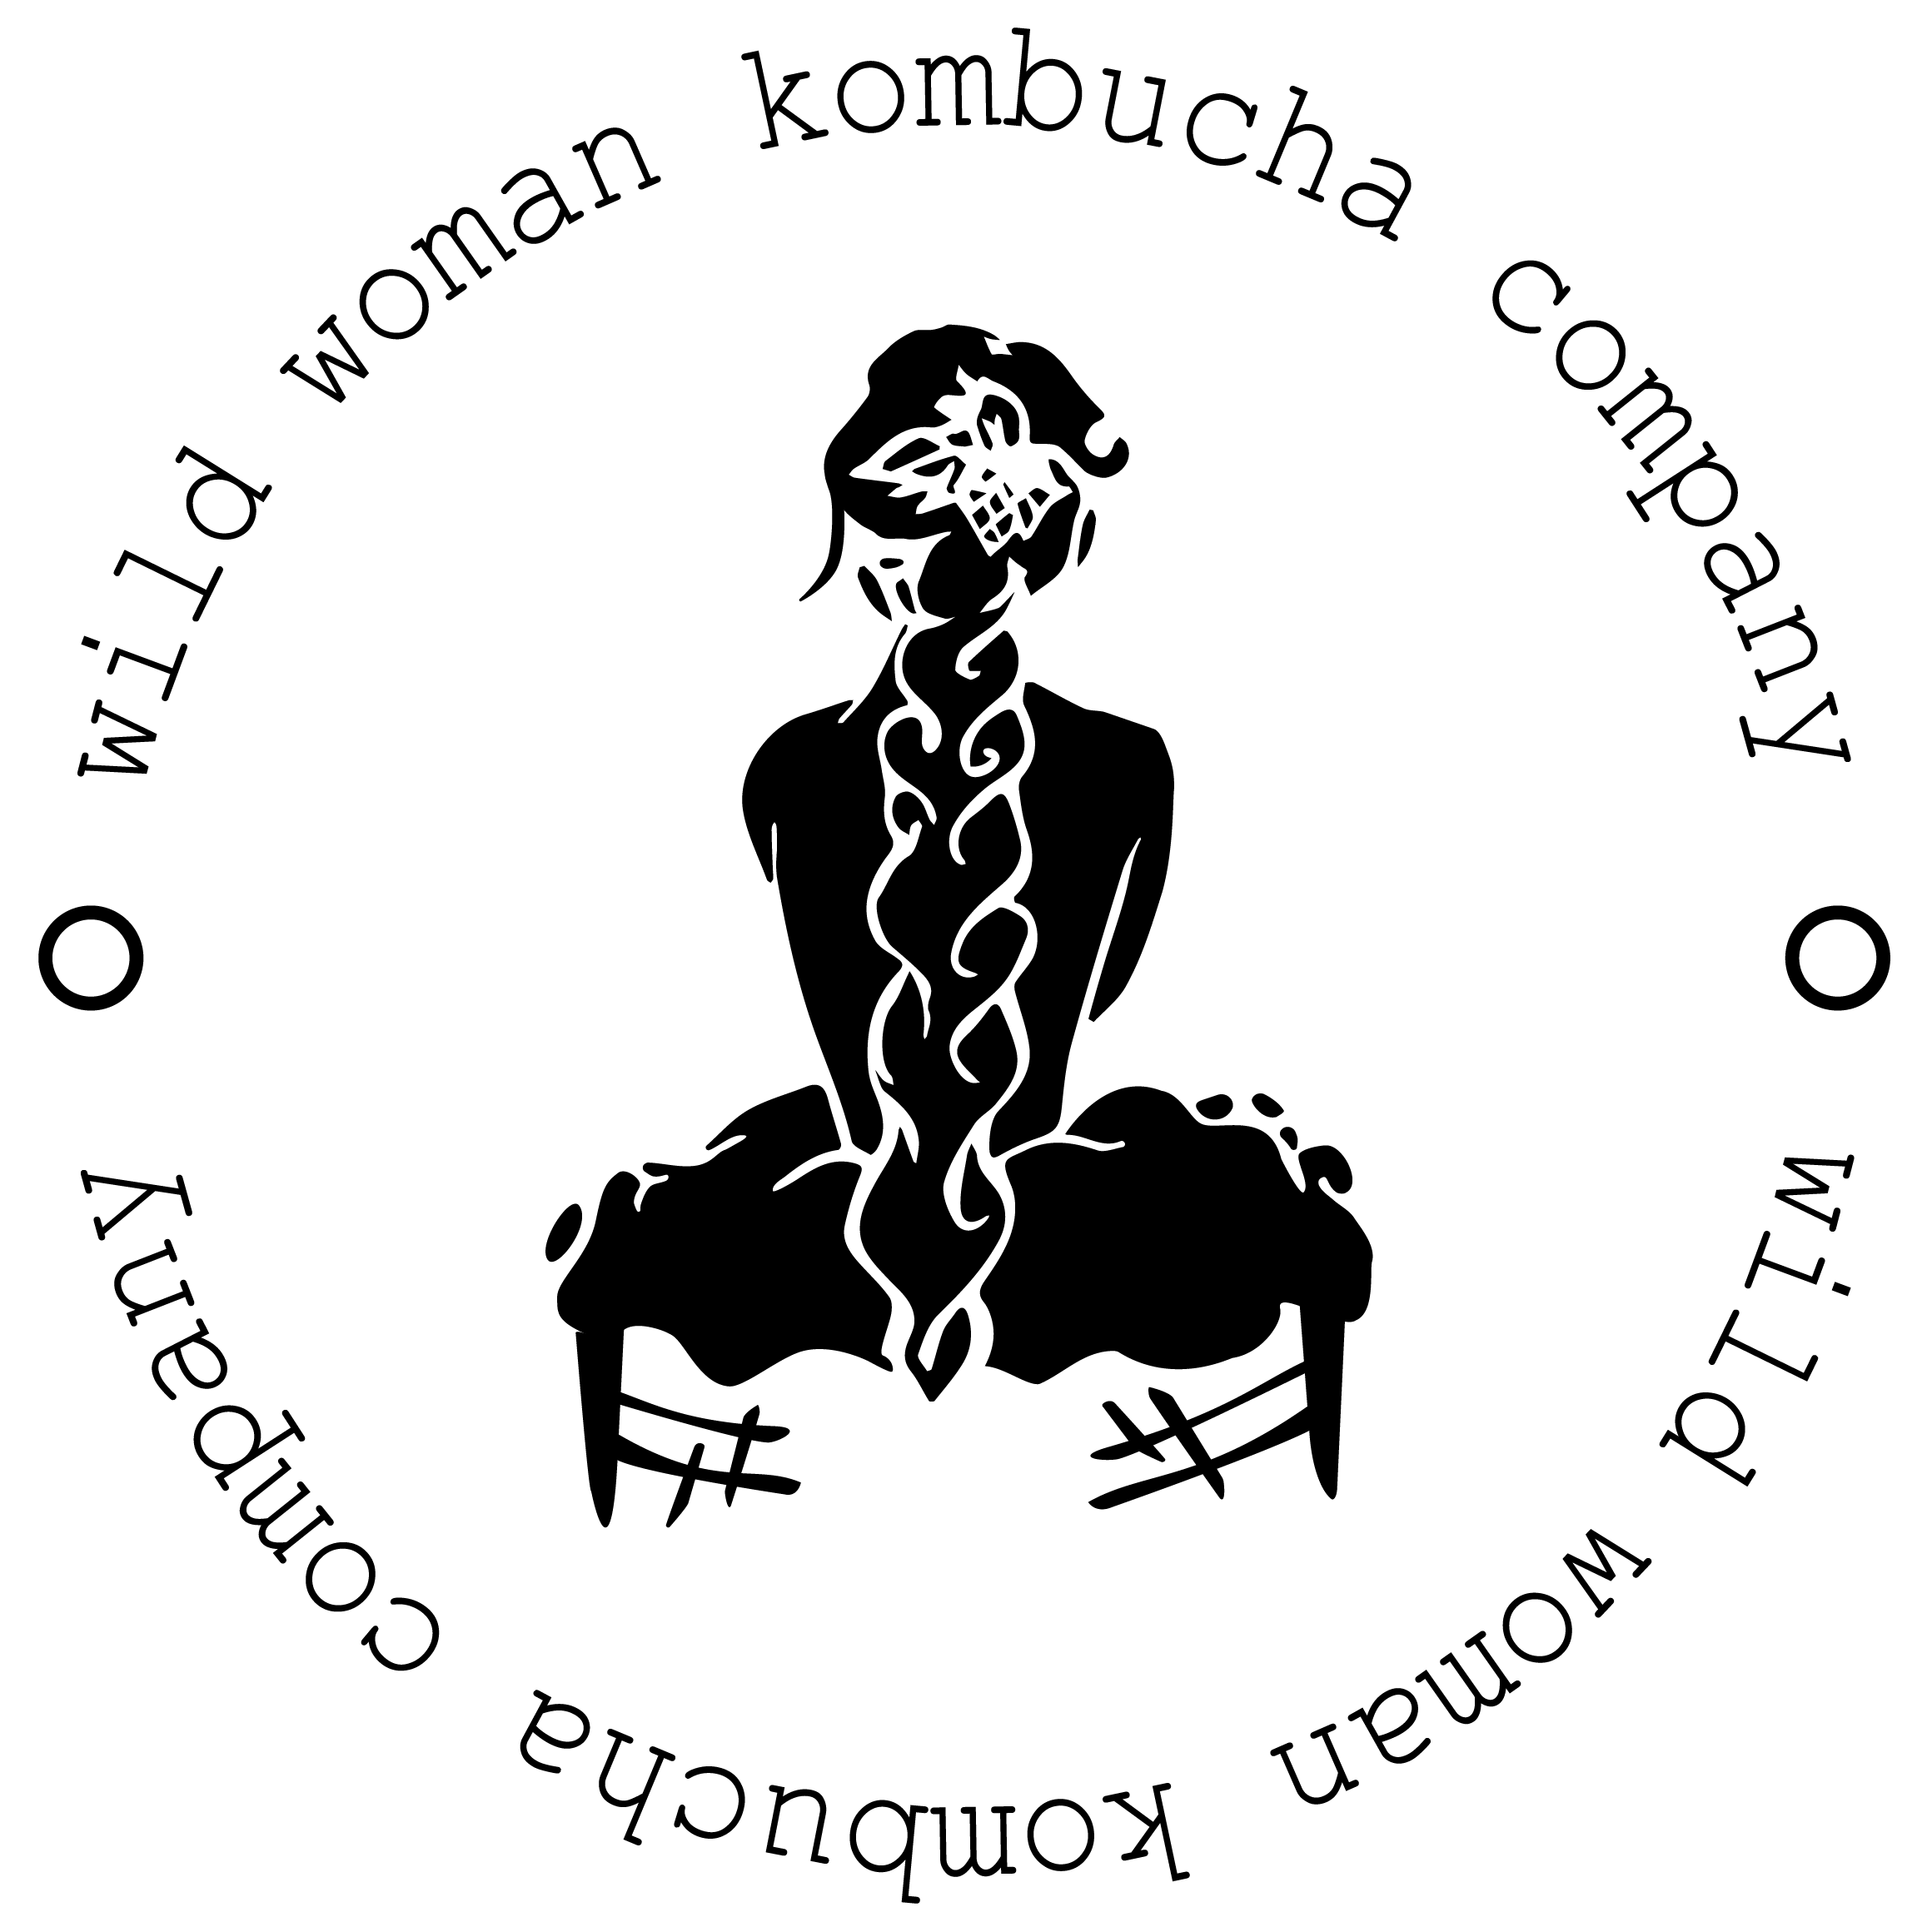 wILF WOMAN KOMBUCHA CO. -